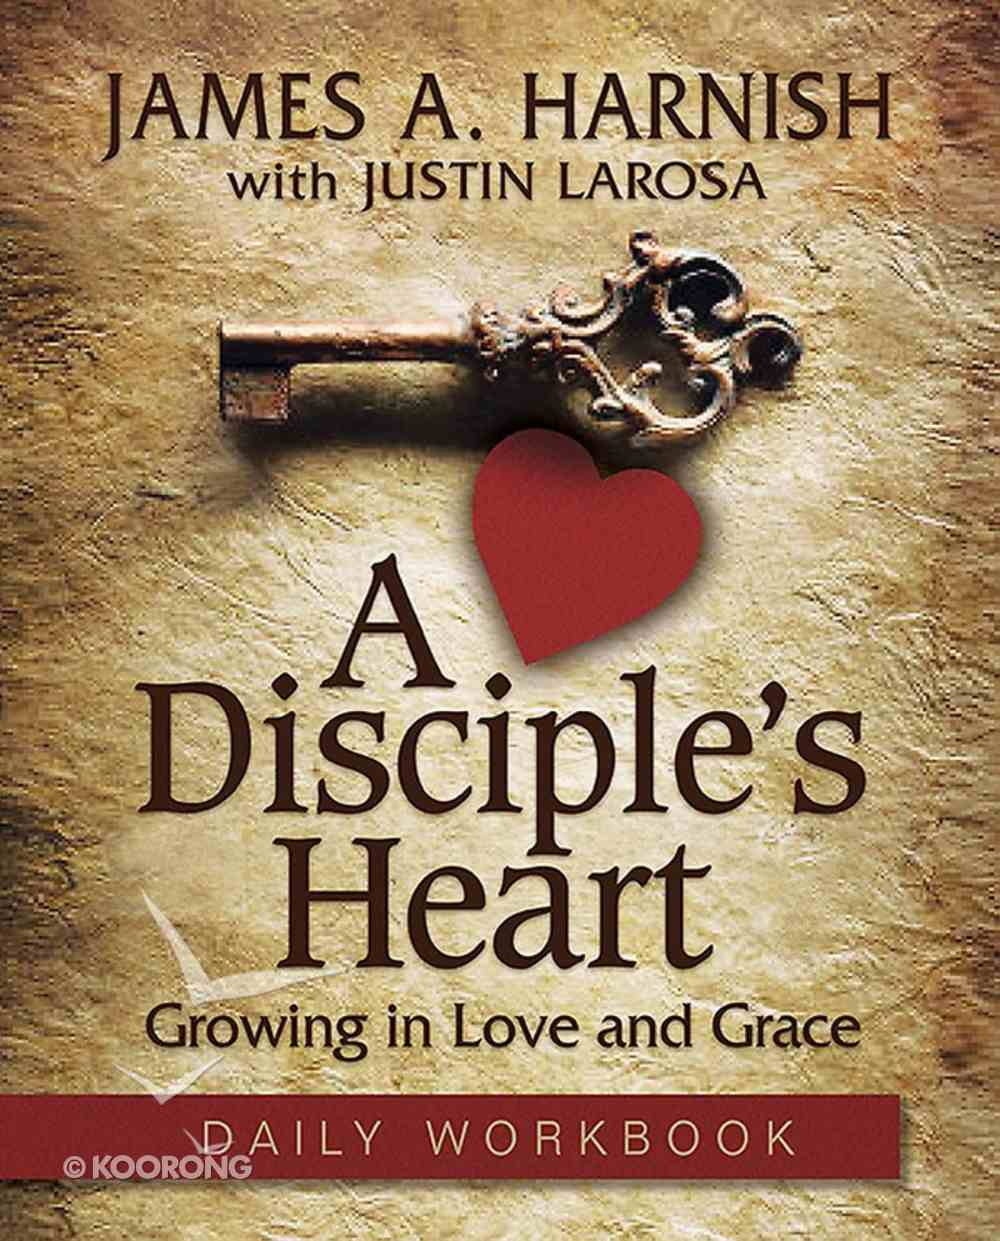 A Disciple's Heart (Daily Workbook) eBook